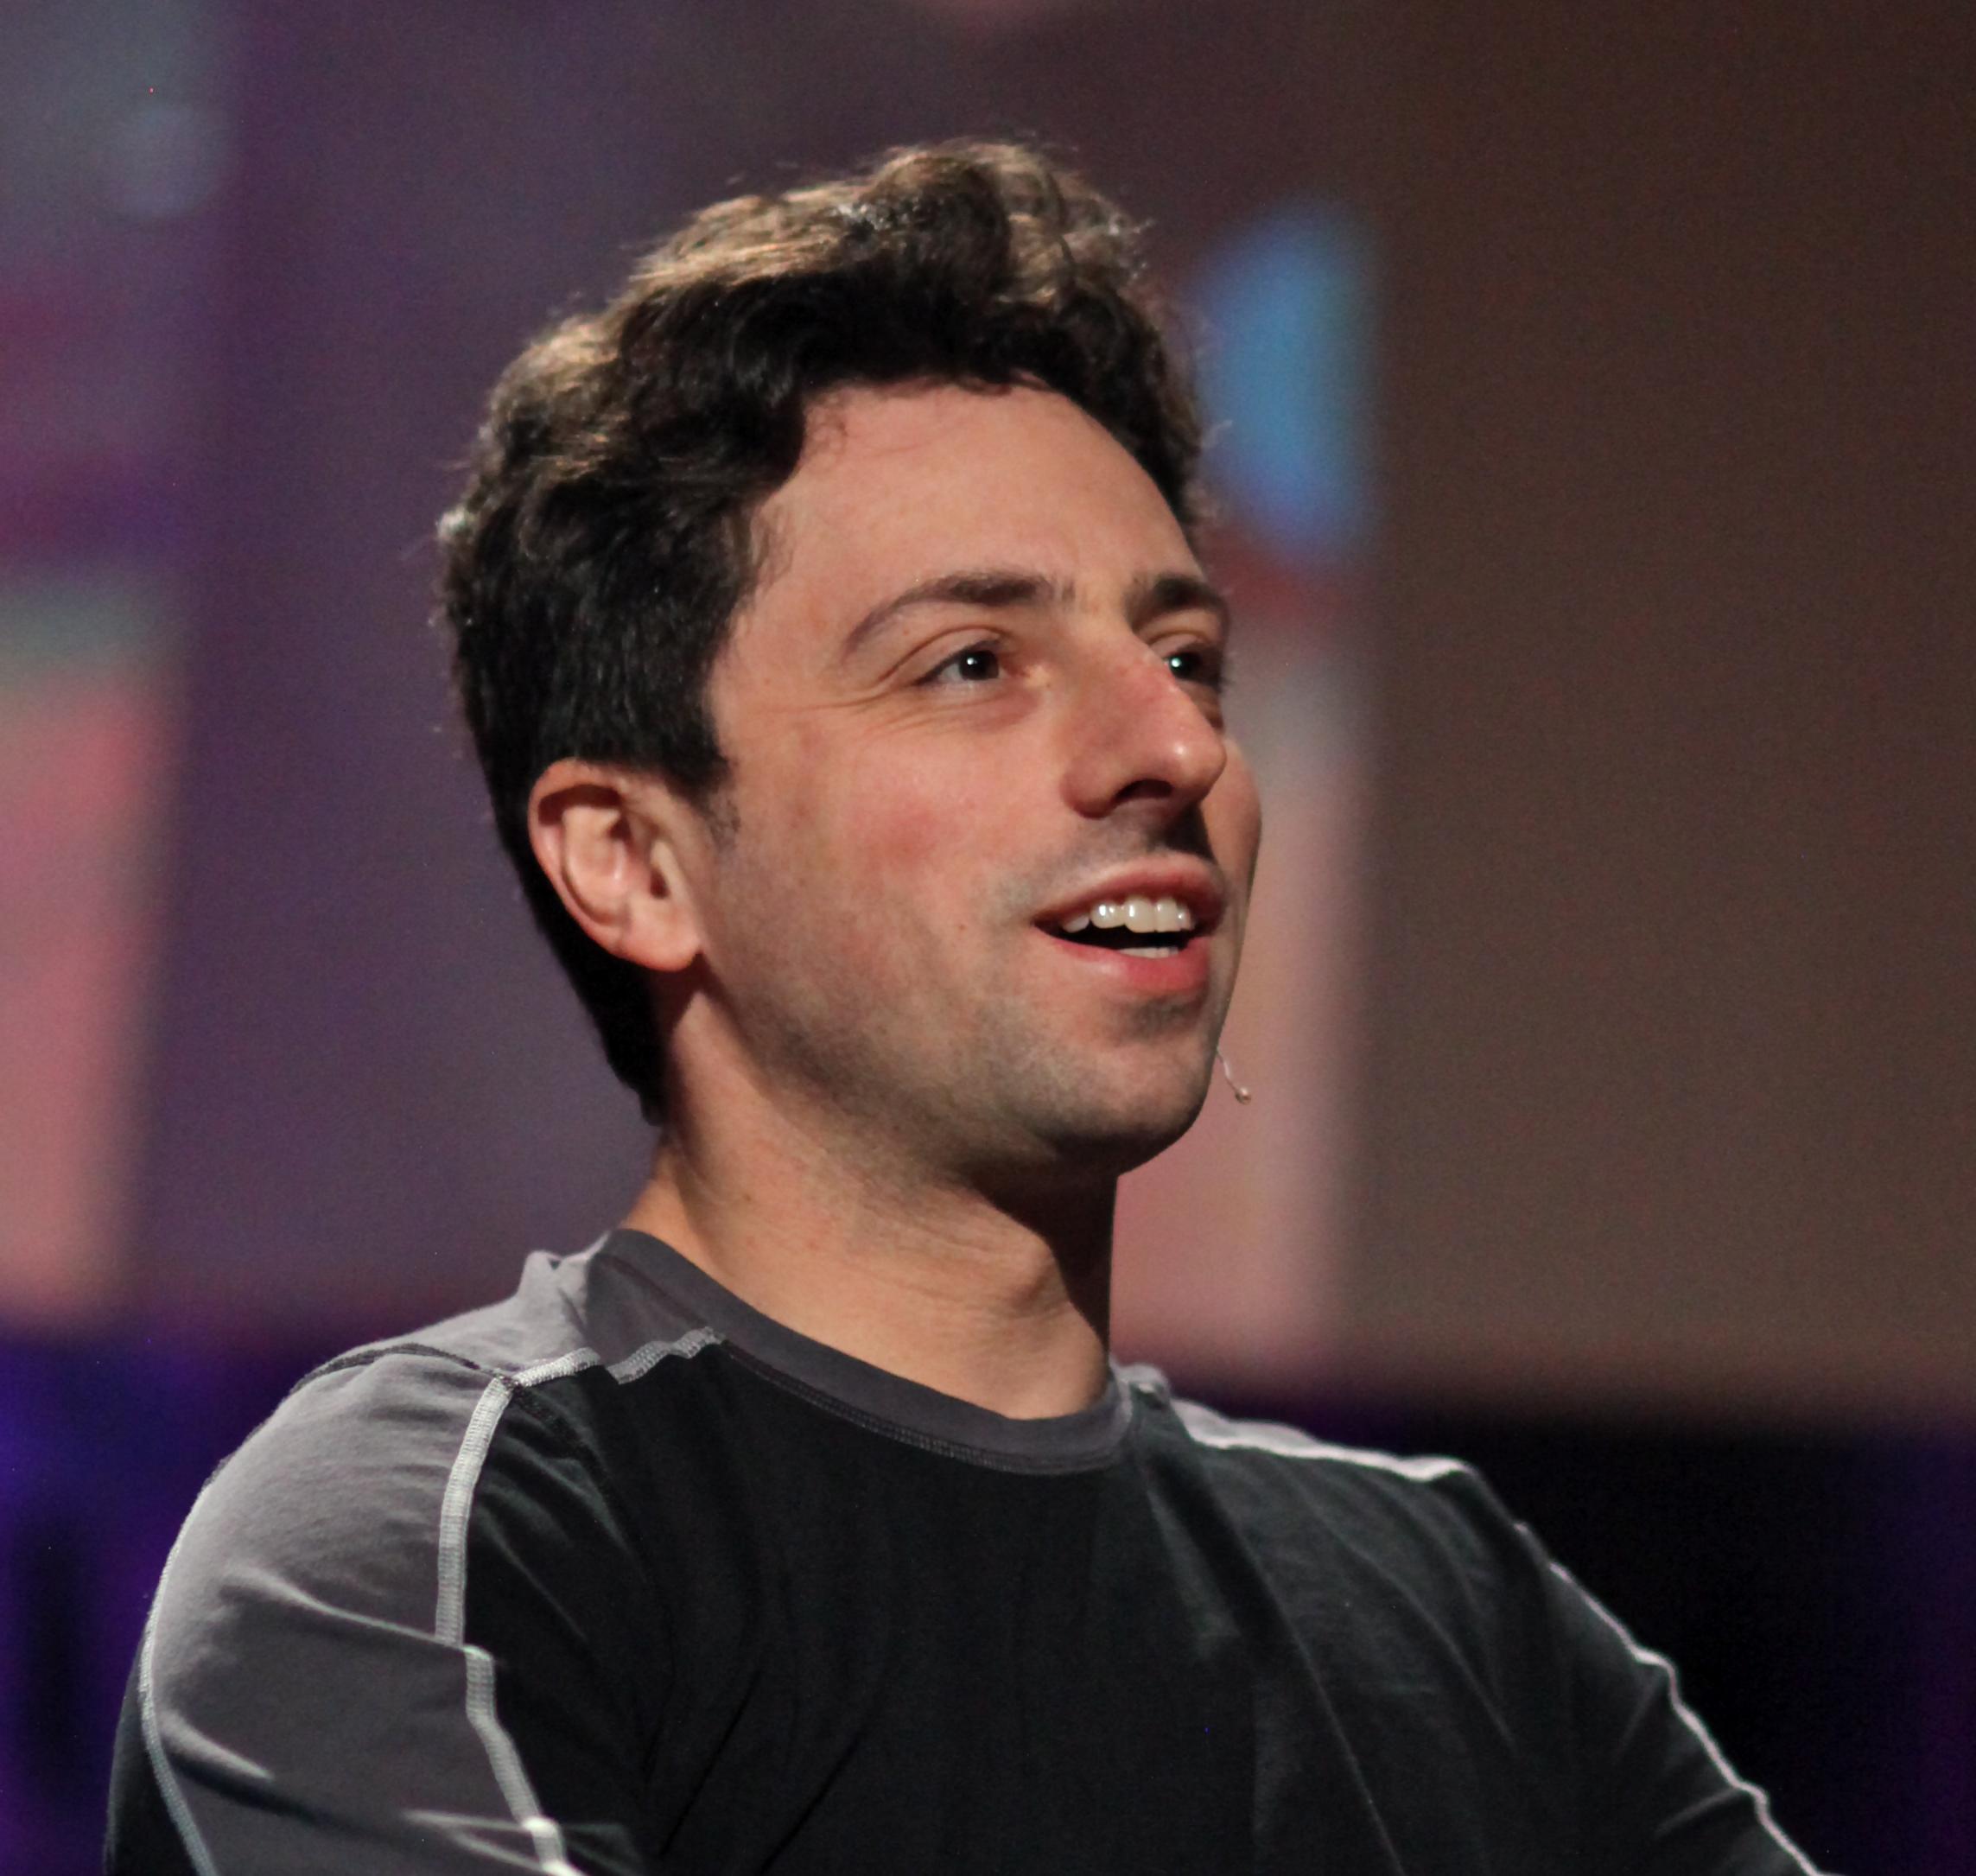 Sergey Brin  - 2021 Regular brown hair & edgy hair style.